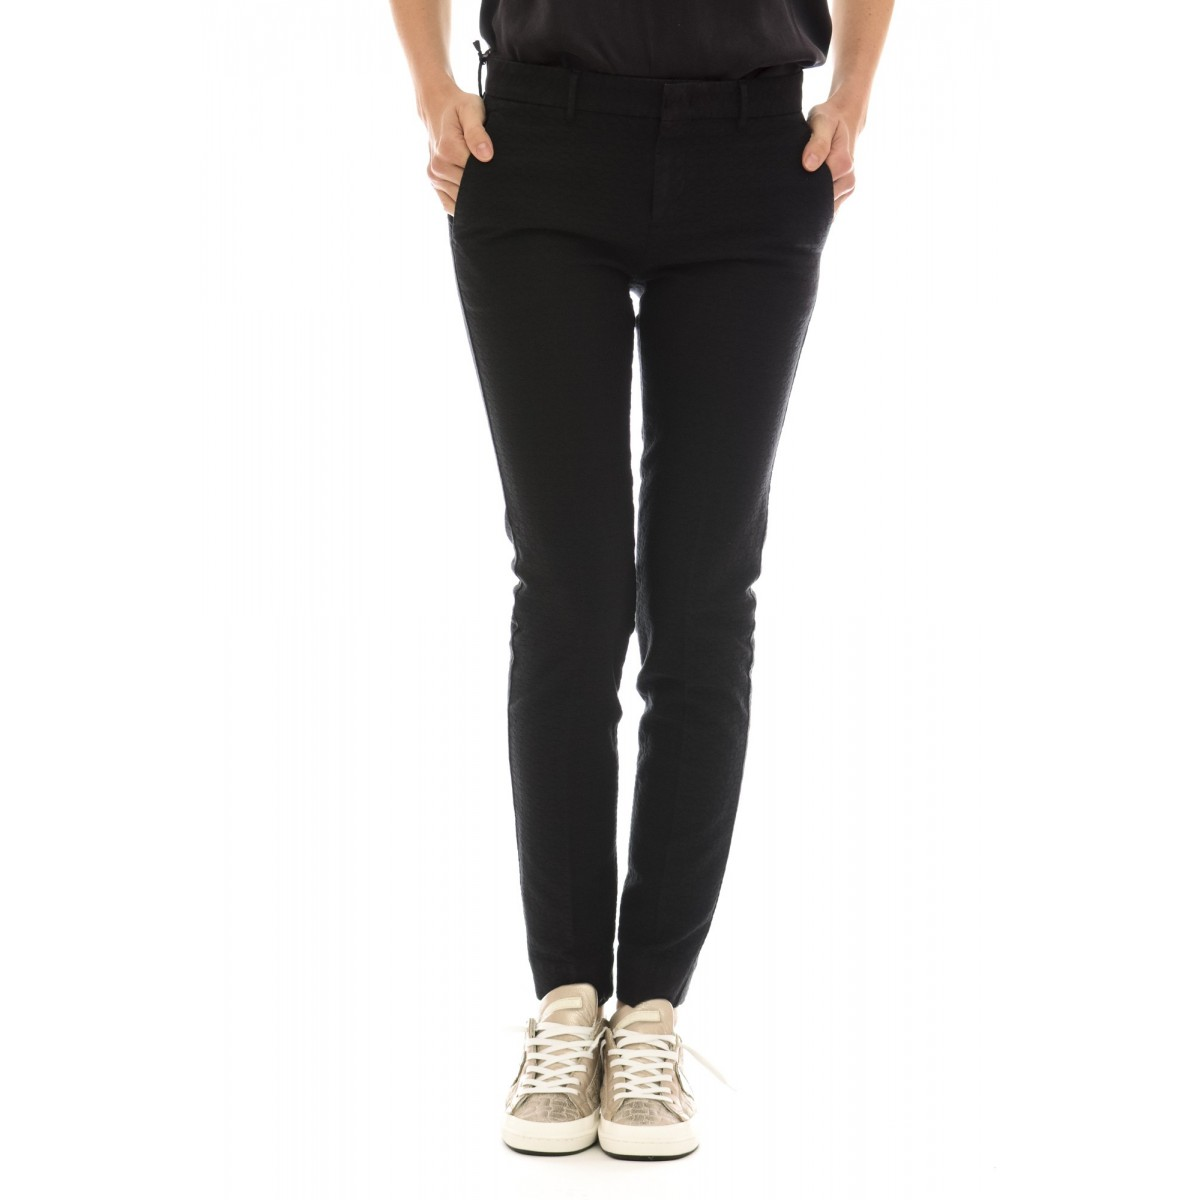 Pantalone PT0W Donna - Cdvtny ka01 cotone operato